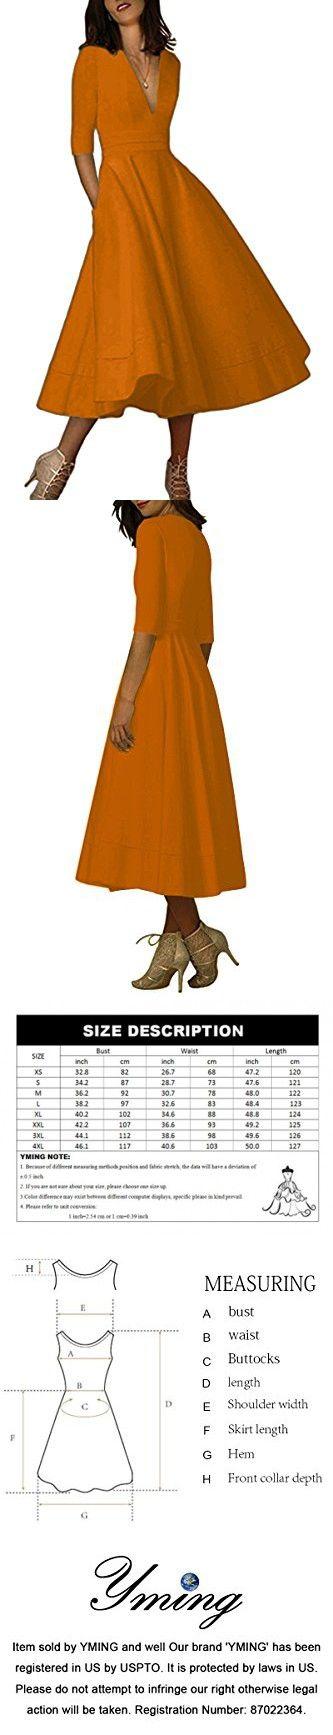 YMING Women/'s Elegant Cocktail Maxi Dress Deep V Neck 3//4 Sleeve Vintage Pleated Dress